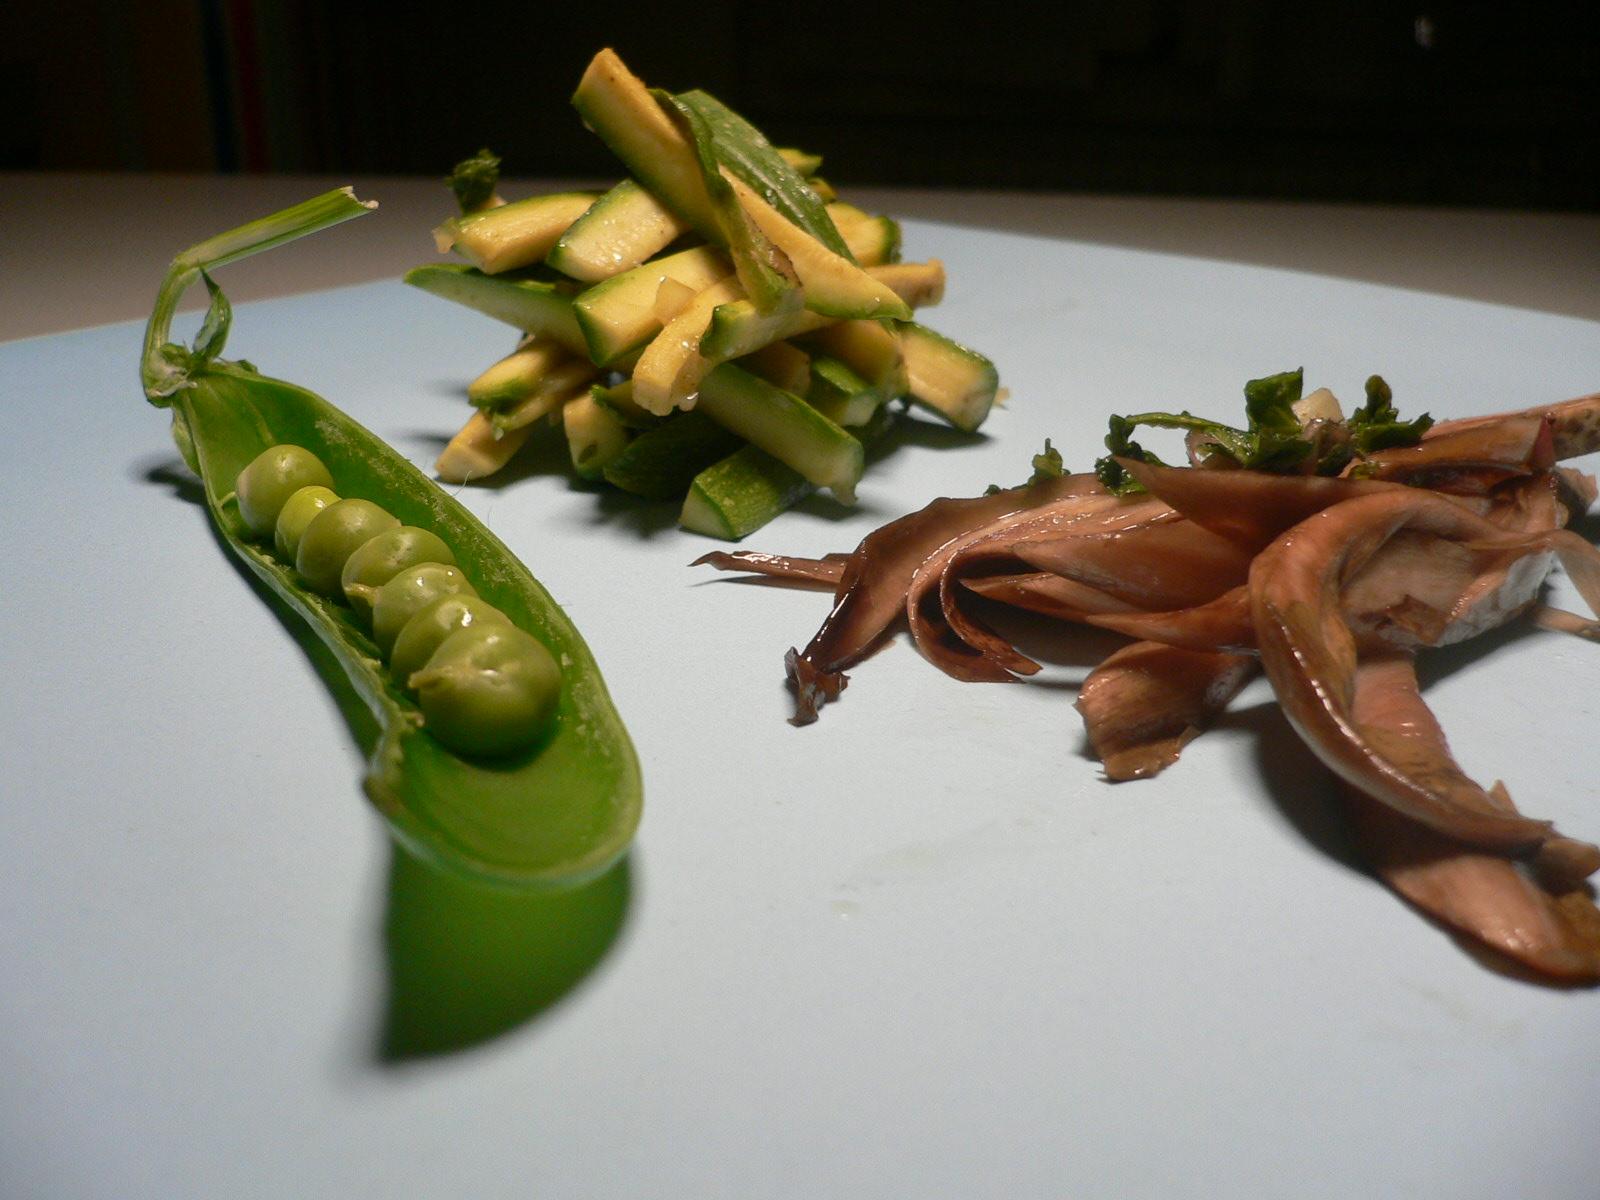 steamed veggies in the dishwasher